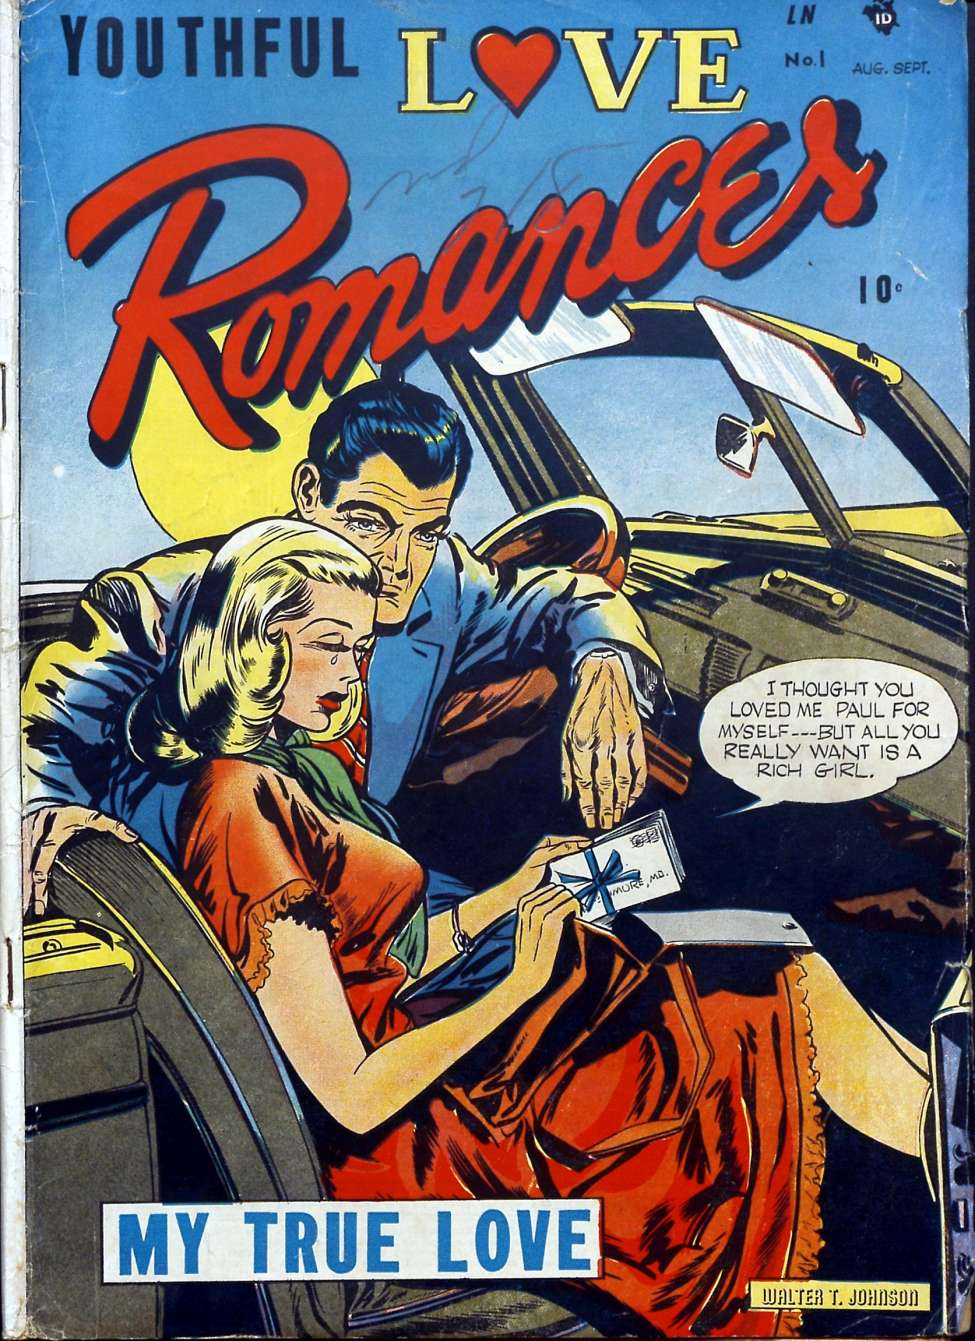 Youthful Love Romances #1, Youthful Magazines